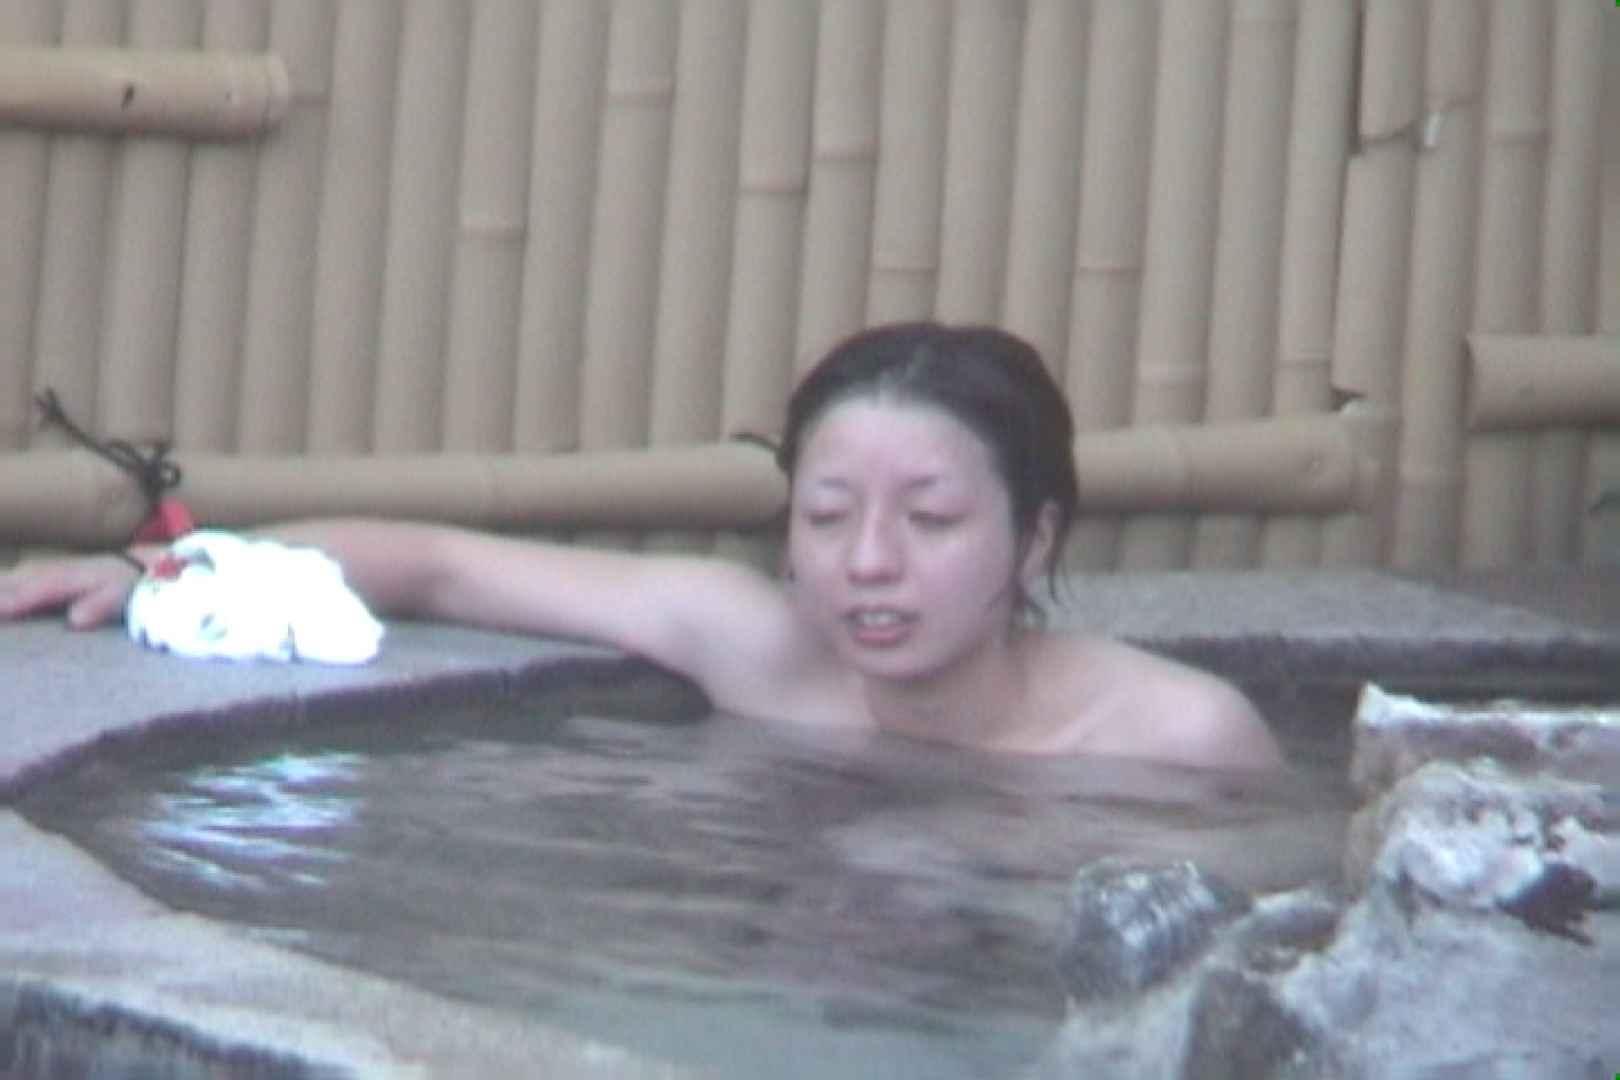 Aquaな露天風呂Vol.608 HなOL | 盗撮  89pic 21